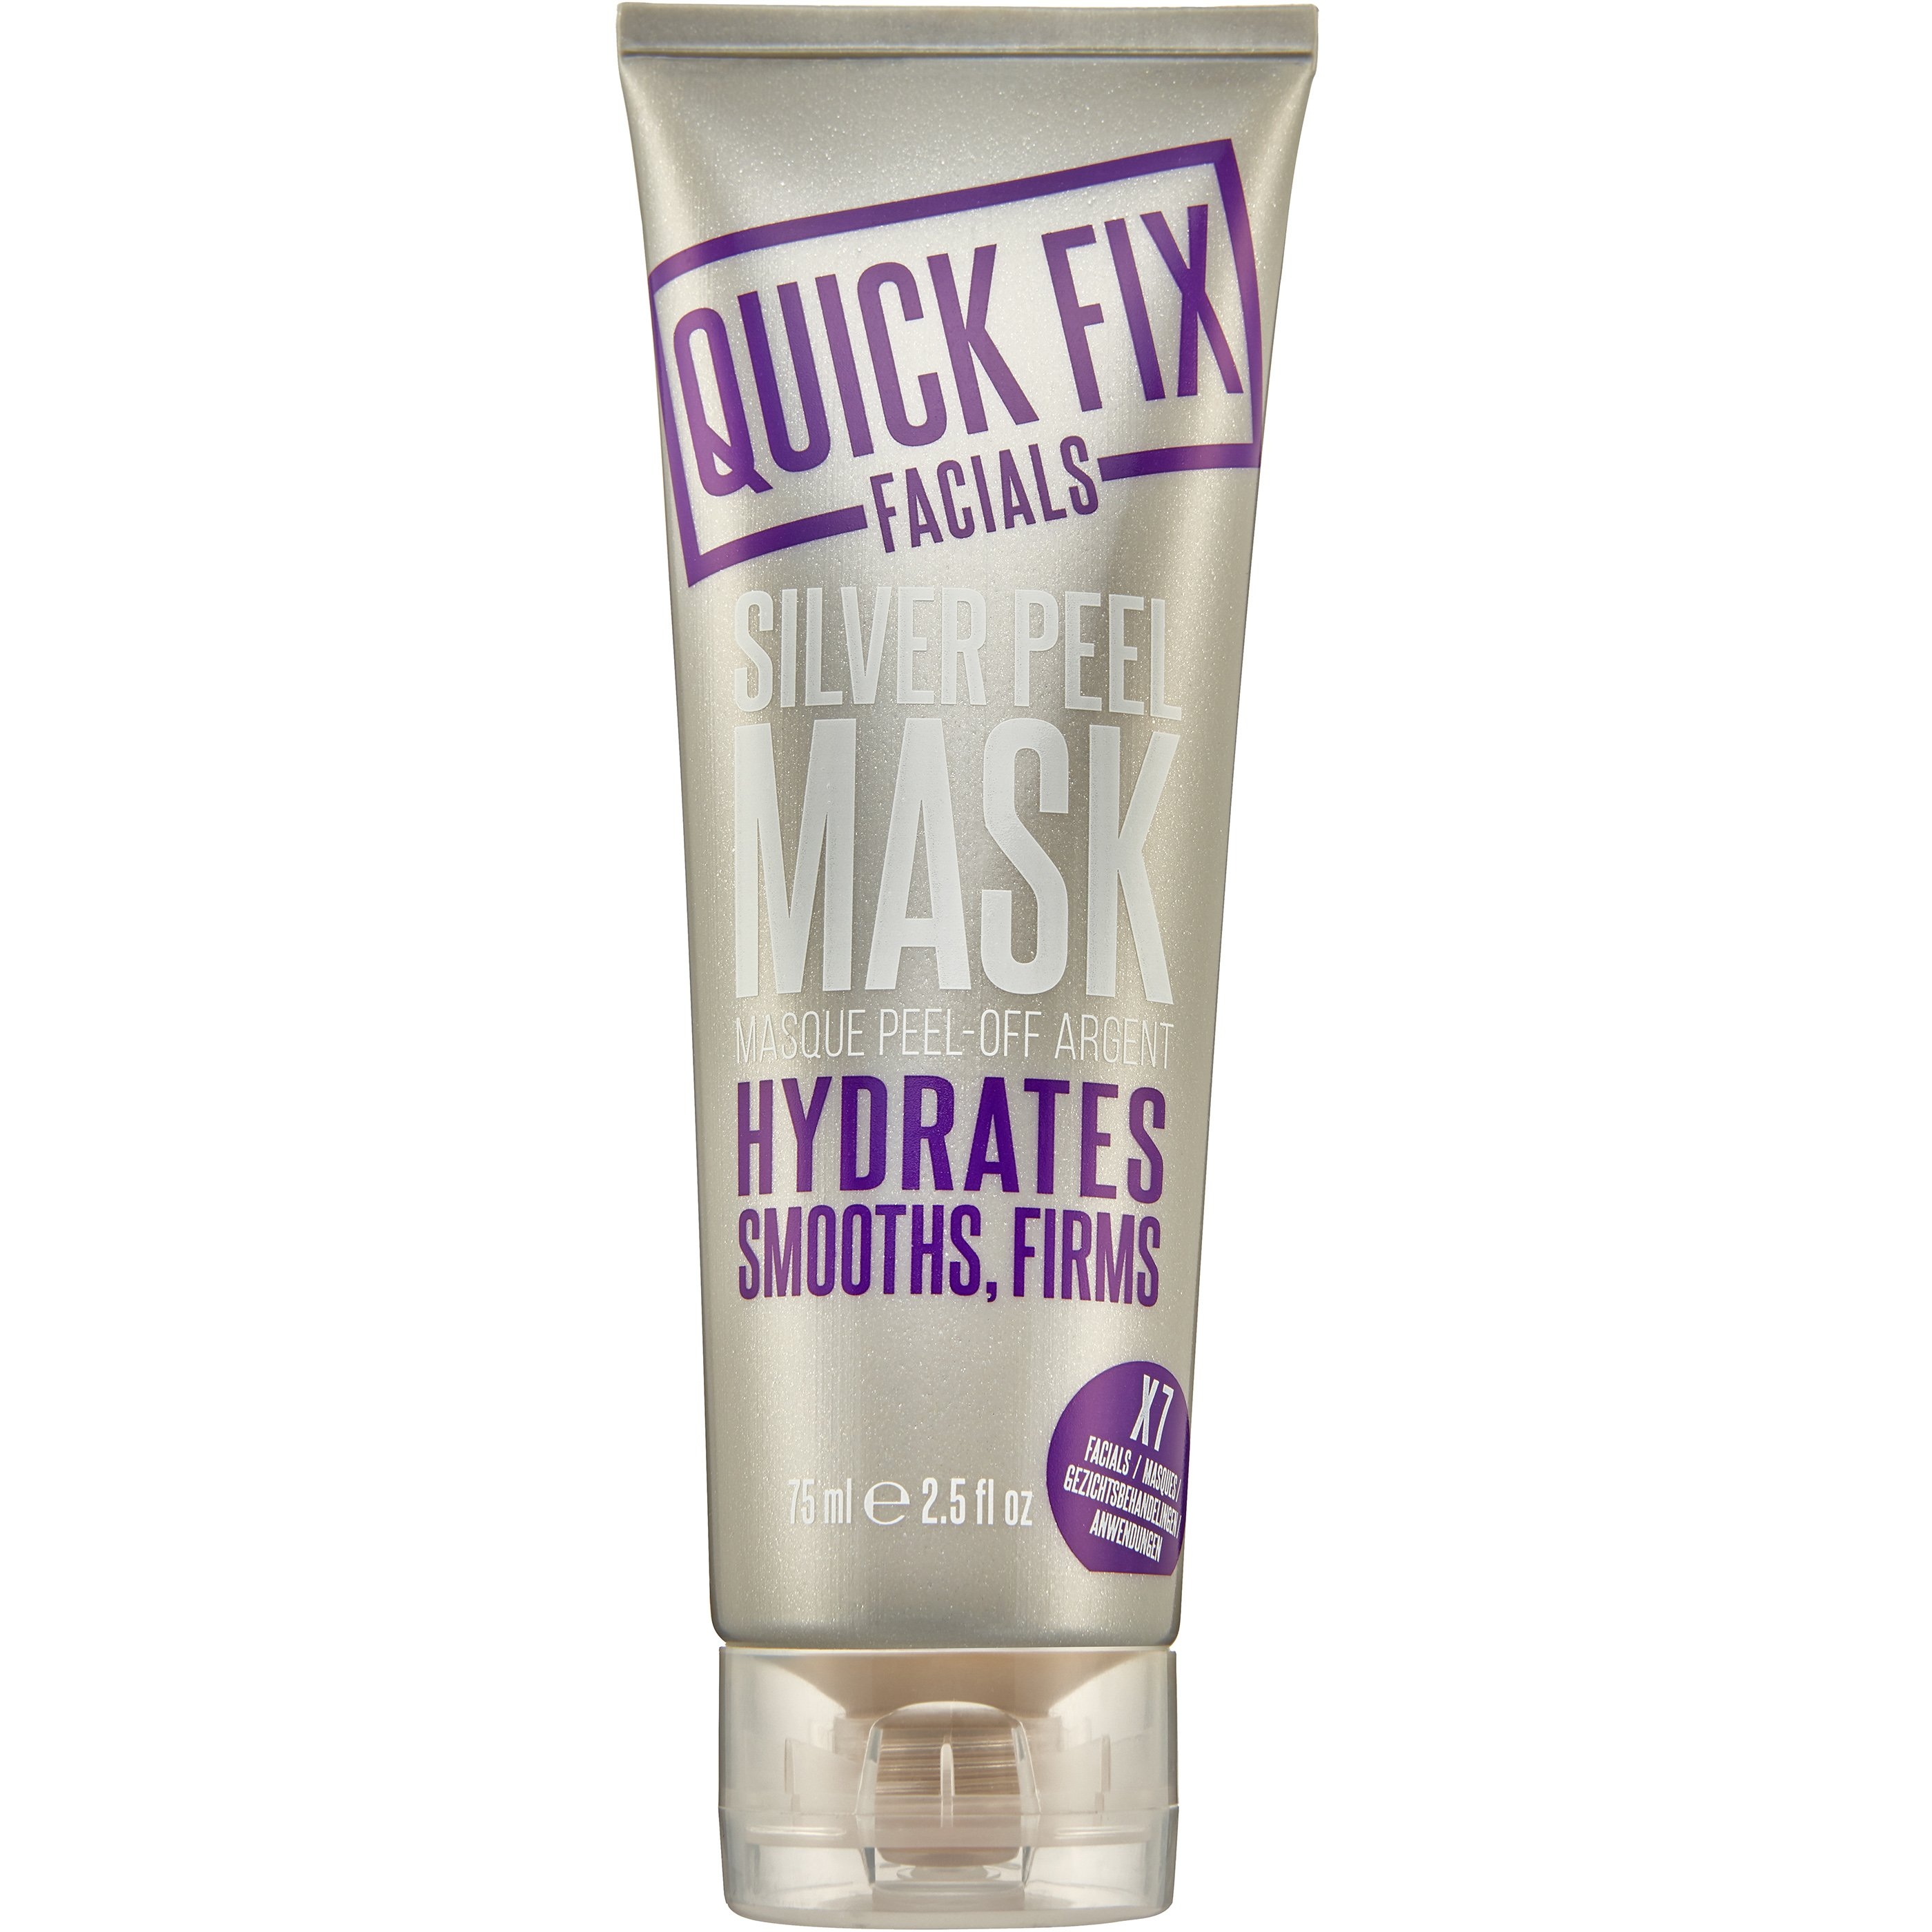 Quick Fix Facials Silver Peel Mask Μάσκα για τις Πρώτες & Ήδη Εγκατεστημένες Ρυτίδες 75ml